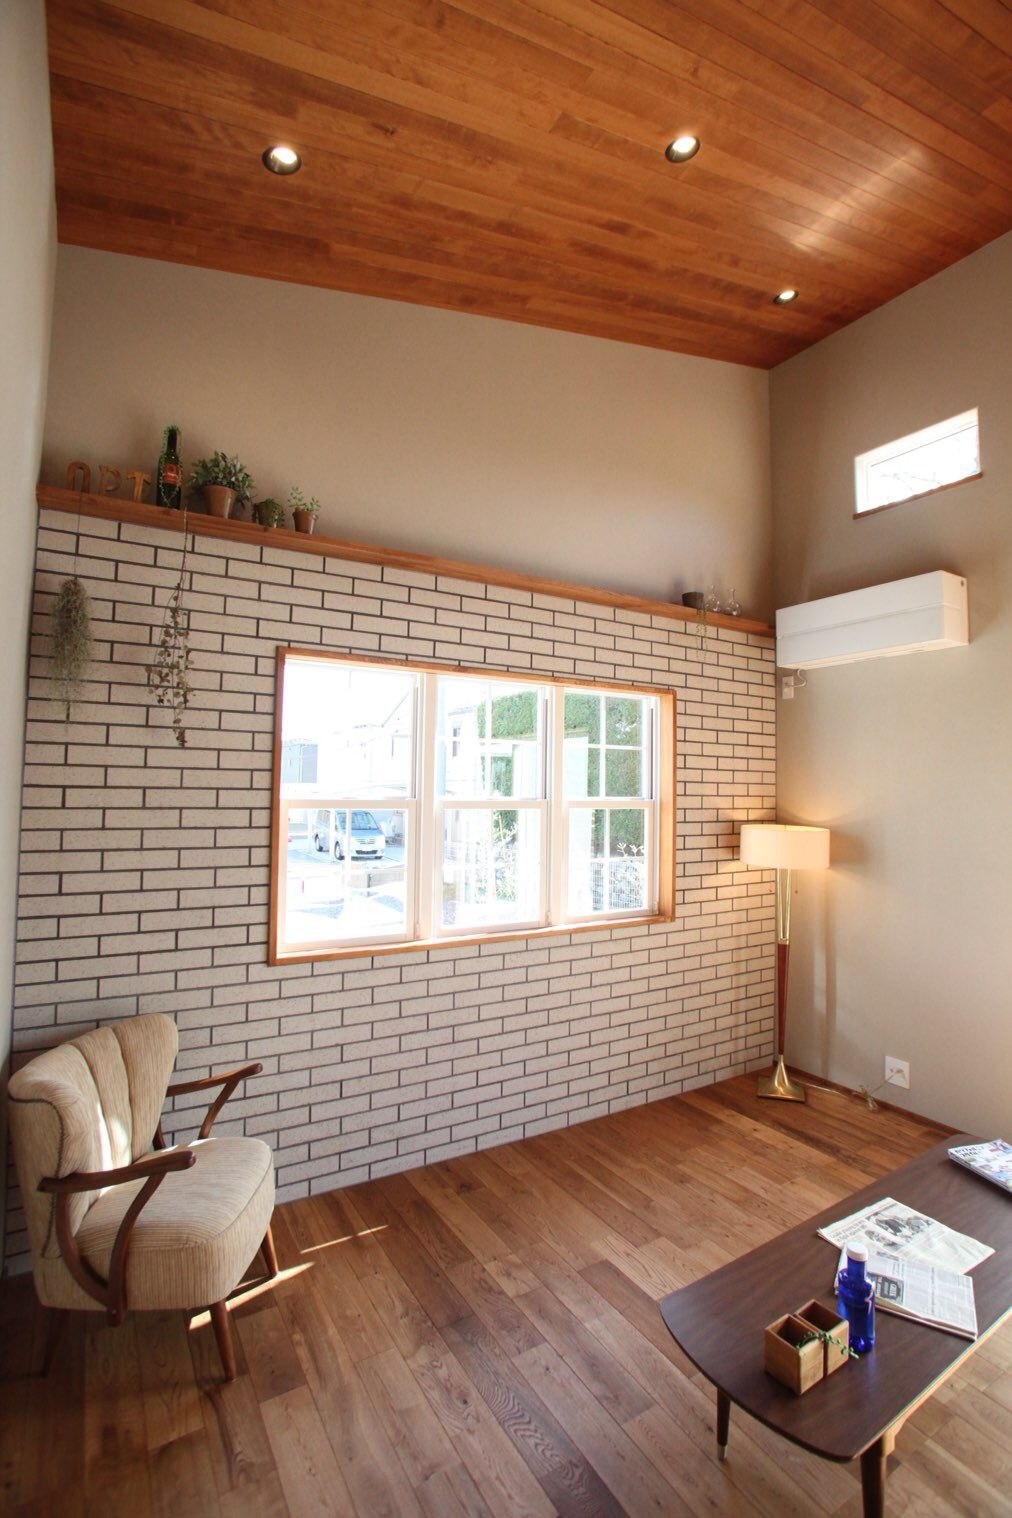 Opthome リビング アクセントタイル ディスプレイ棚 オーク無垢材 平屋 勾配天井 天井板張り 2020 自宅で リビング 家